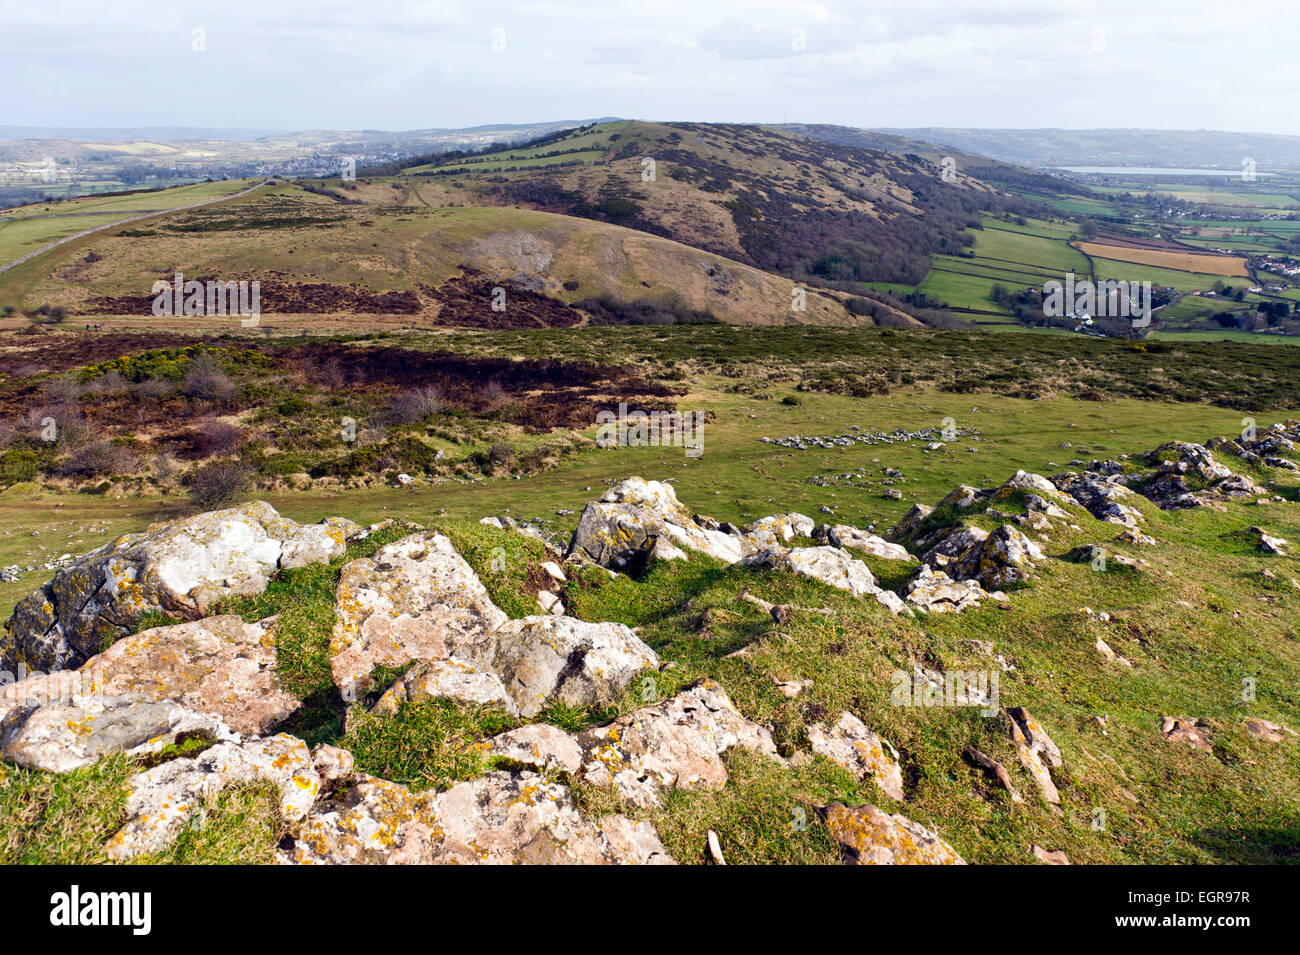 Crook Peak, Mendip hills, Somerset, England - Stock Image